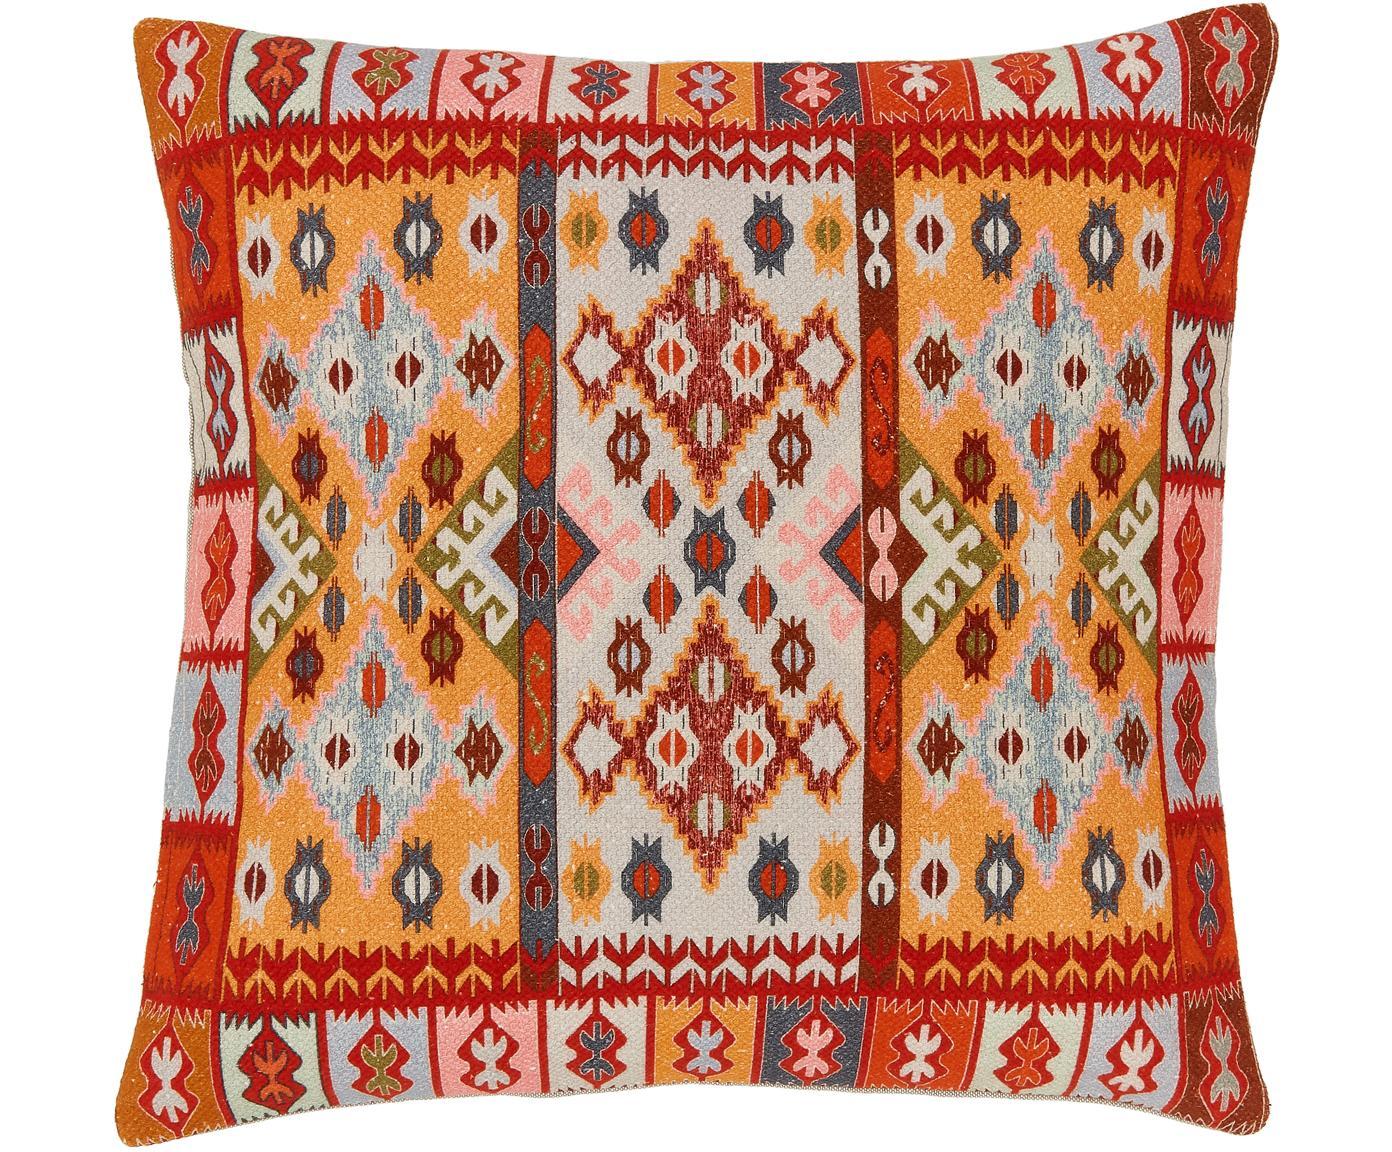 Ethno kussenhoes Budak, Katoen, Multicolour, 45 x 45 cm